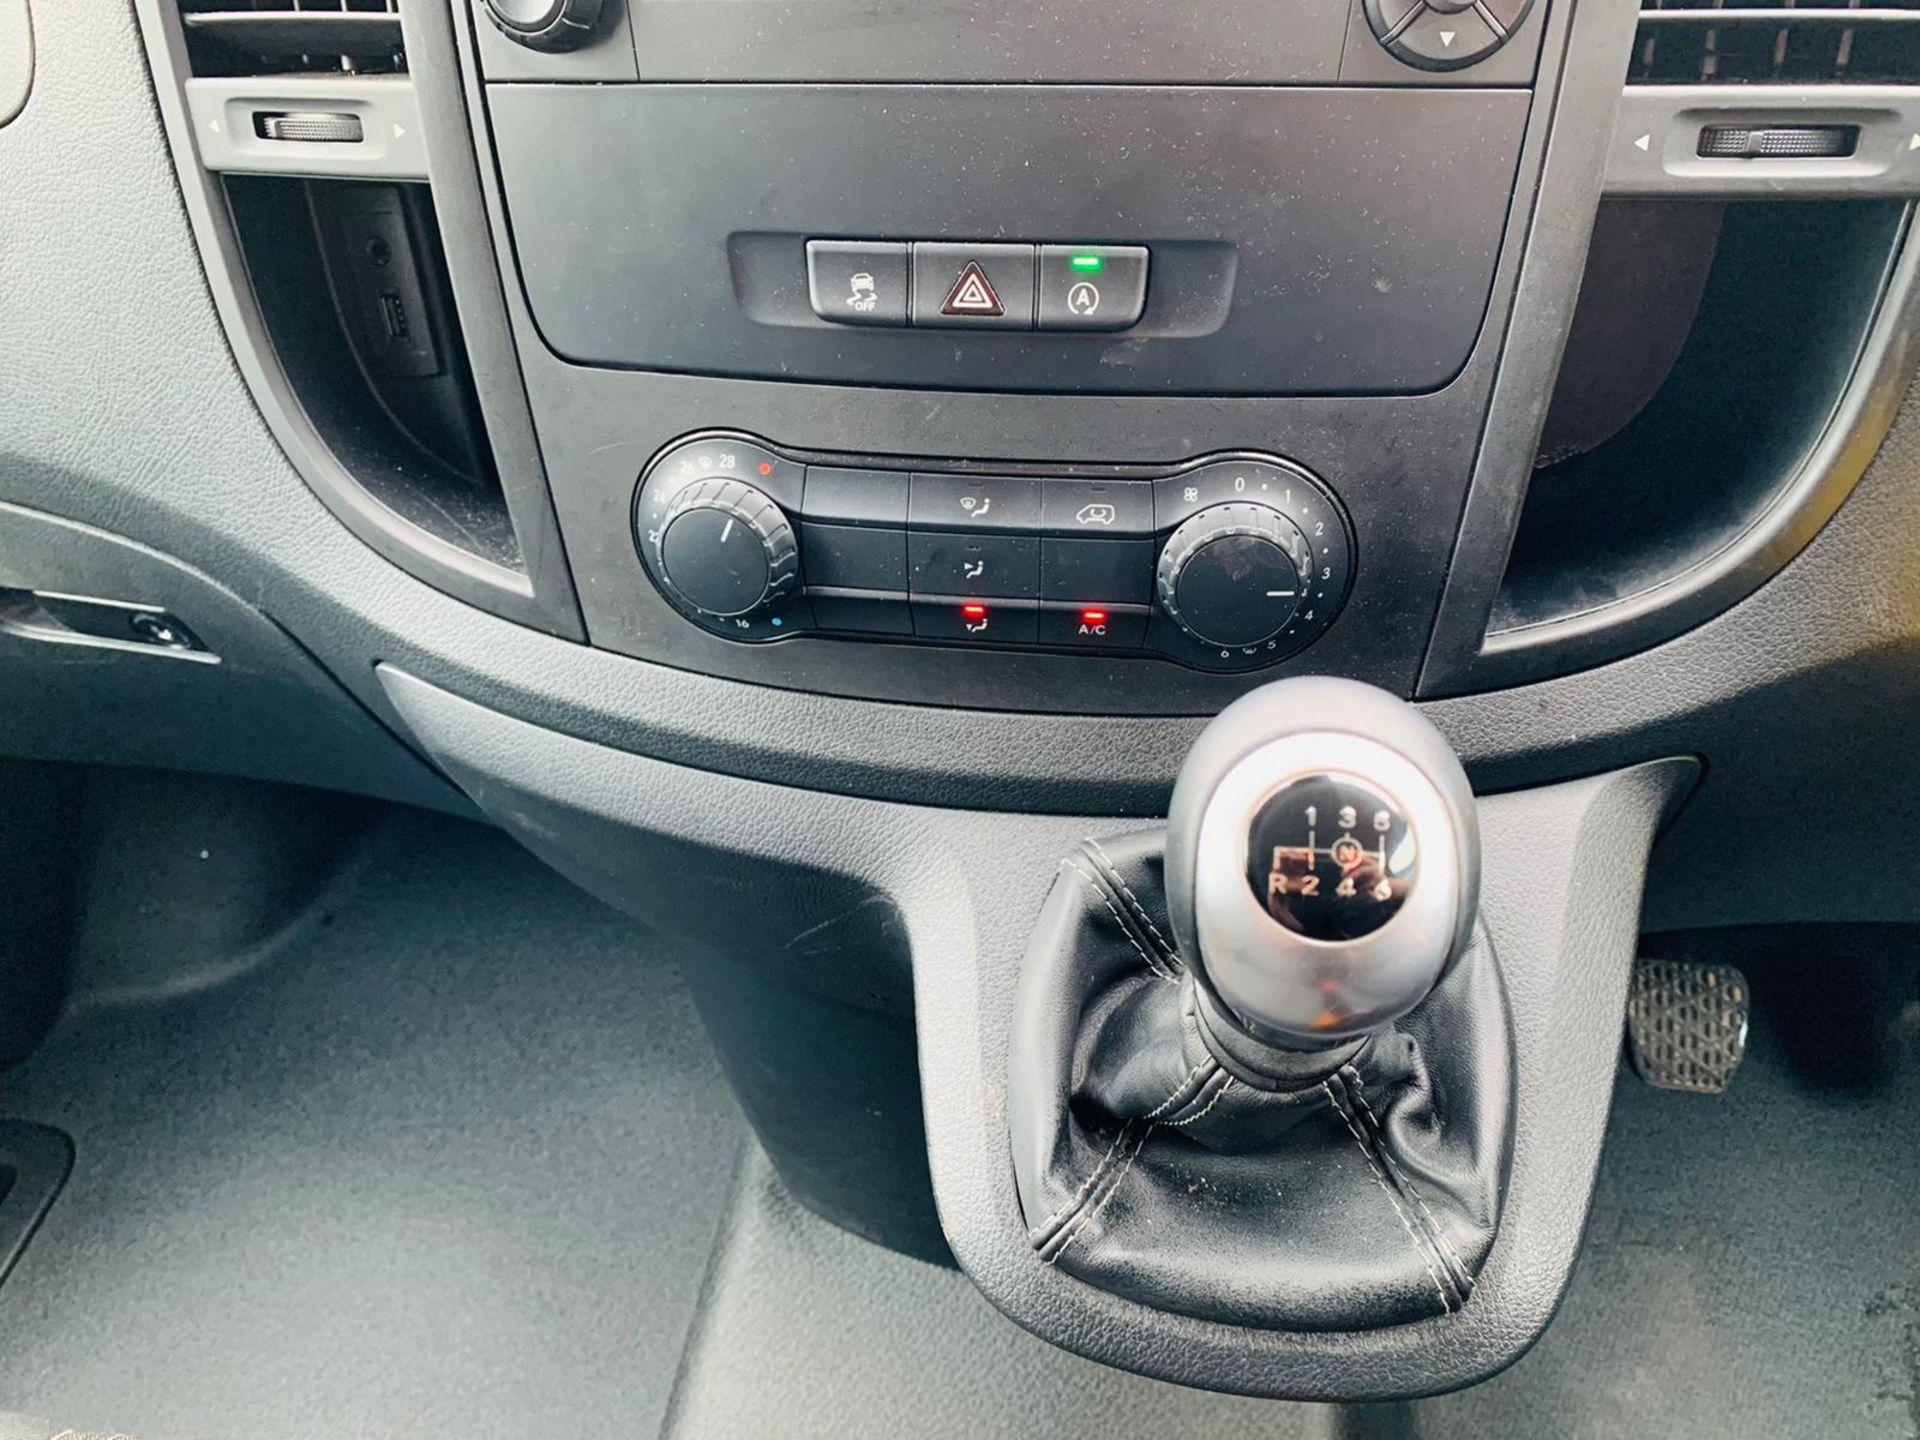 (RESERVE MET) Mercedes Vito 116Cdi Sporty Spec (161 BHP) Bluetech 6 Speed Van - 2016 Model - AC - Image 19 of 28